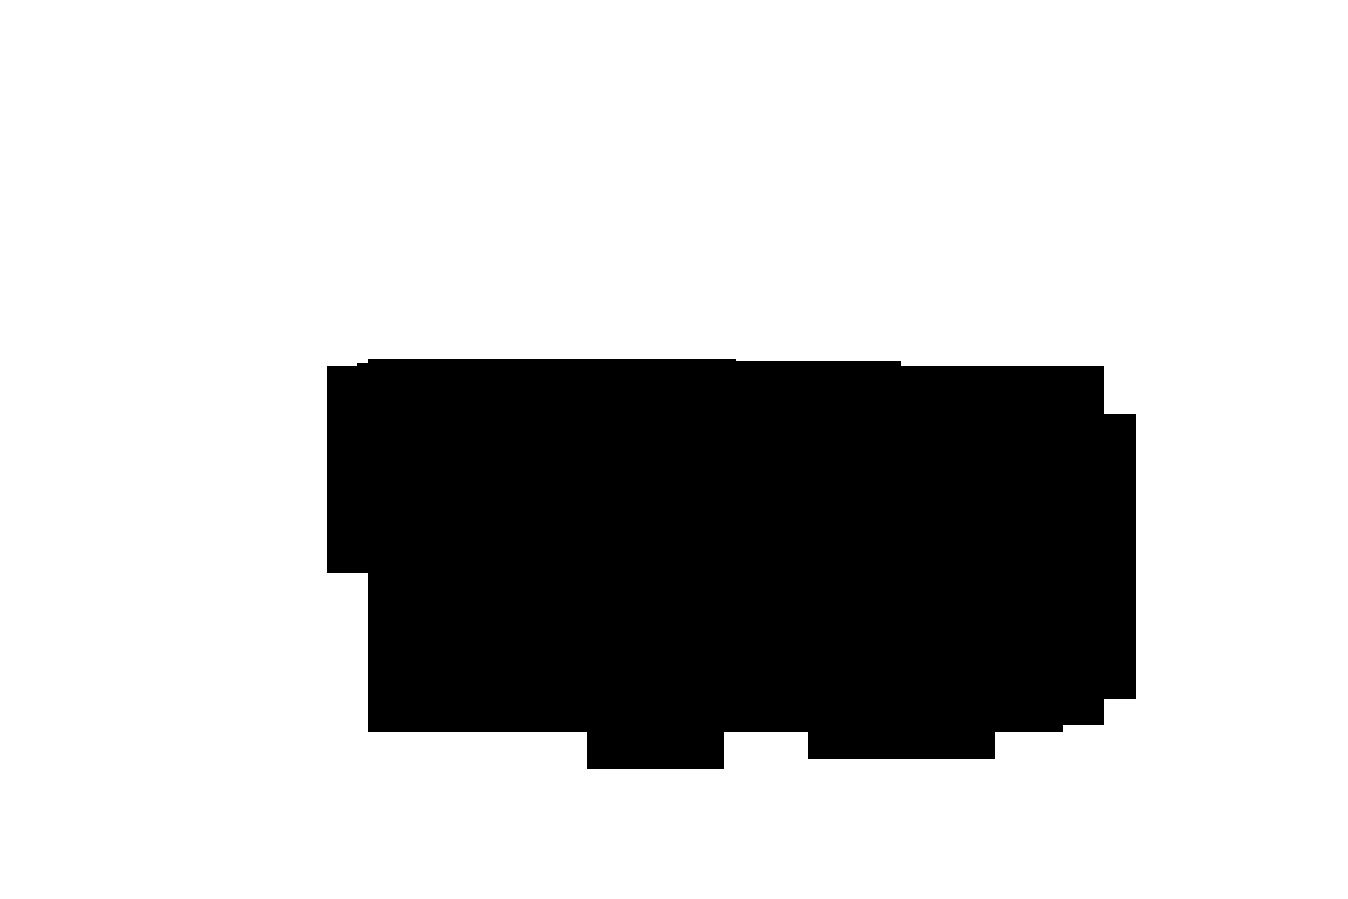 Bestellgrößen:11 = 455 cm Rechtseinzug; 12 = 455 cm Linkseinzug